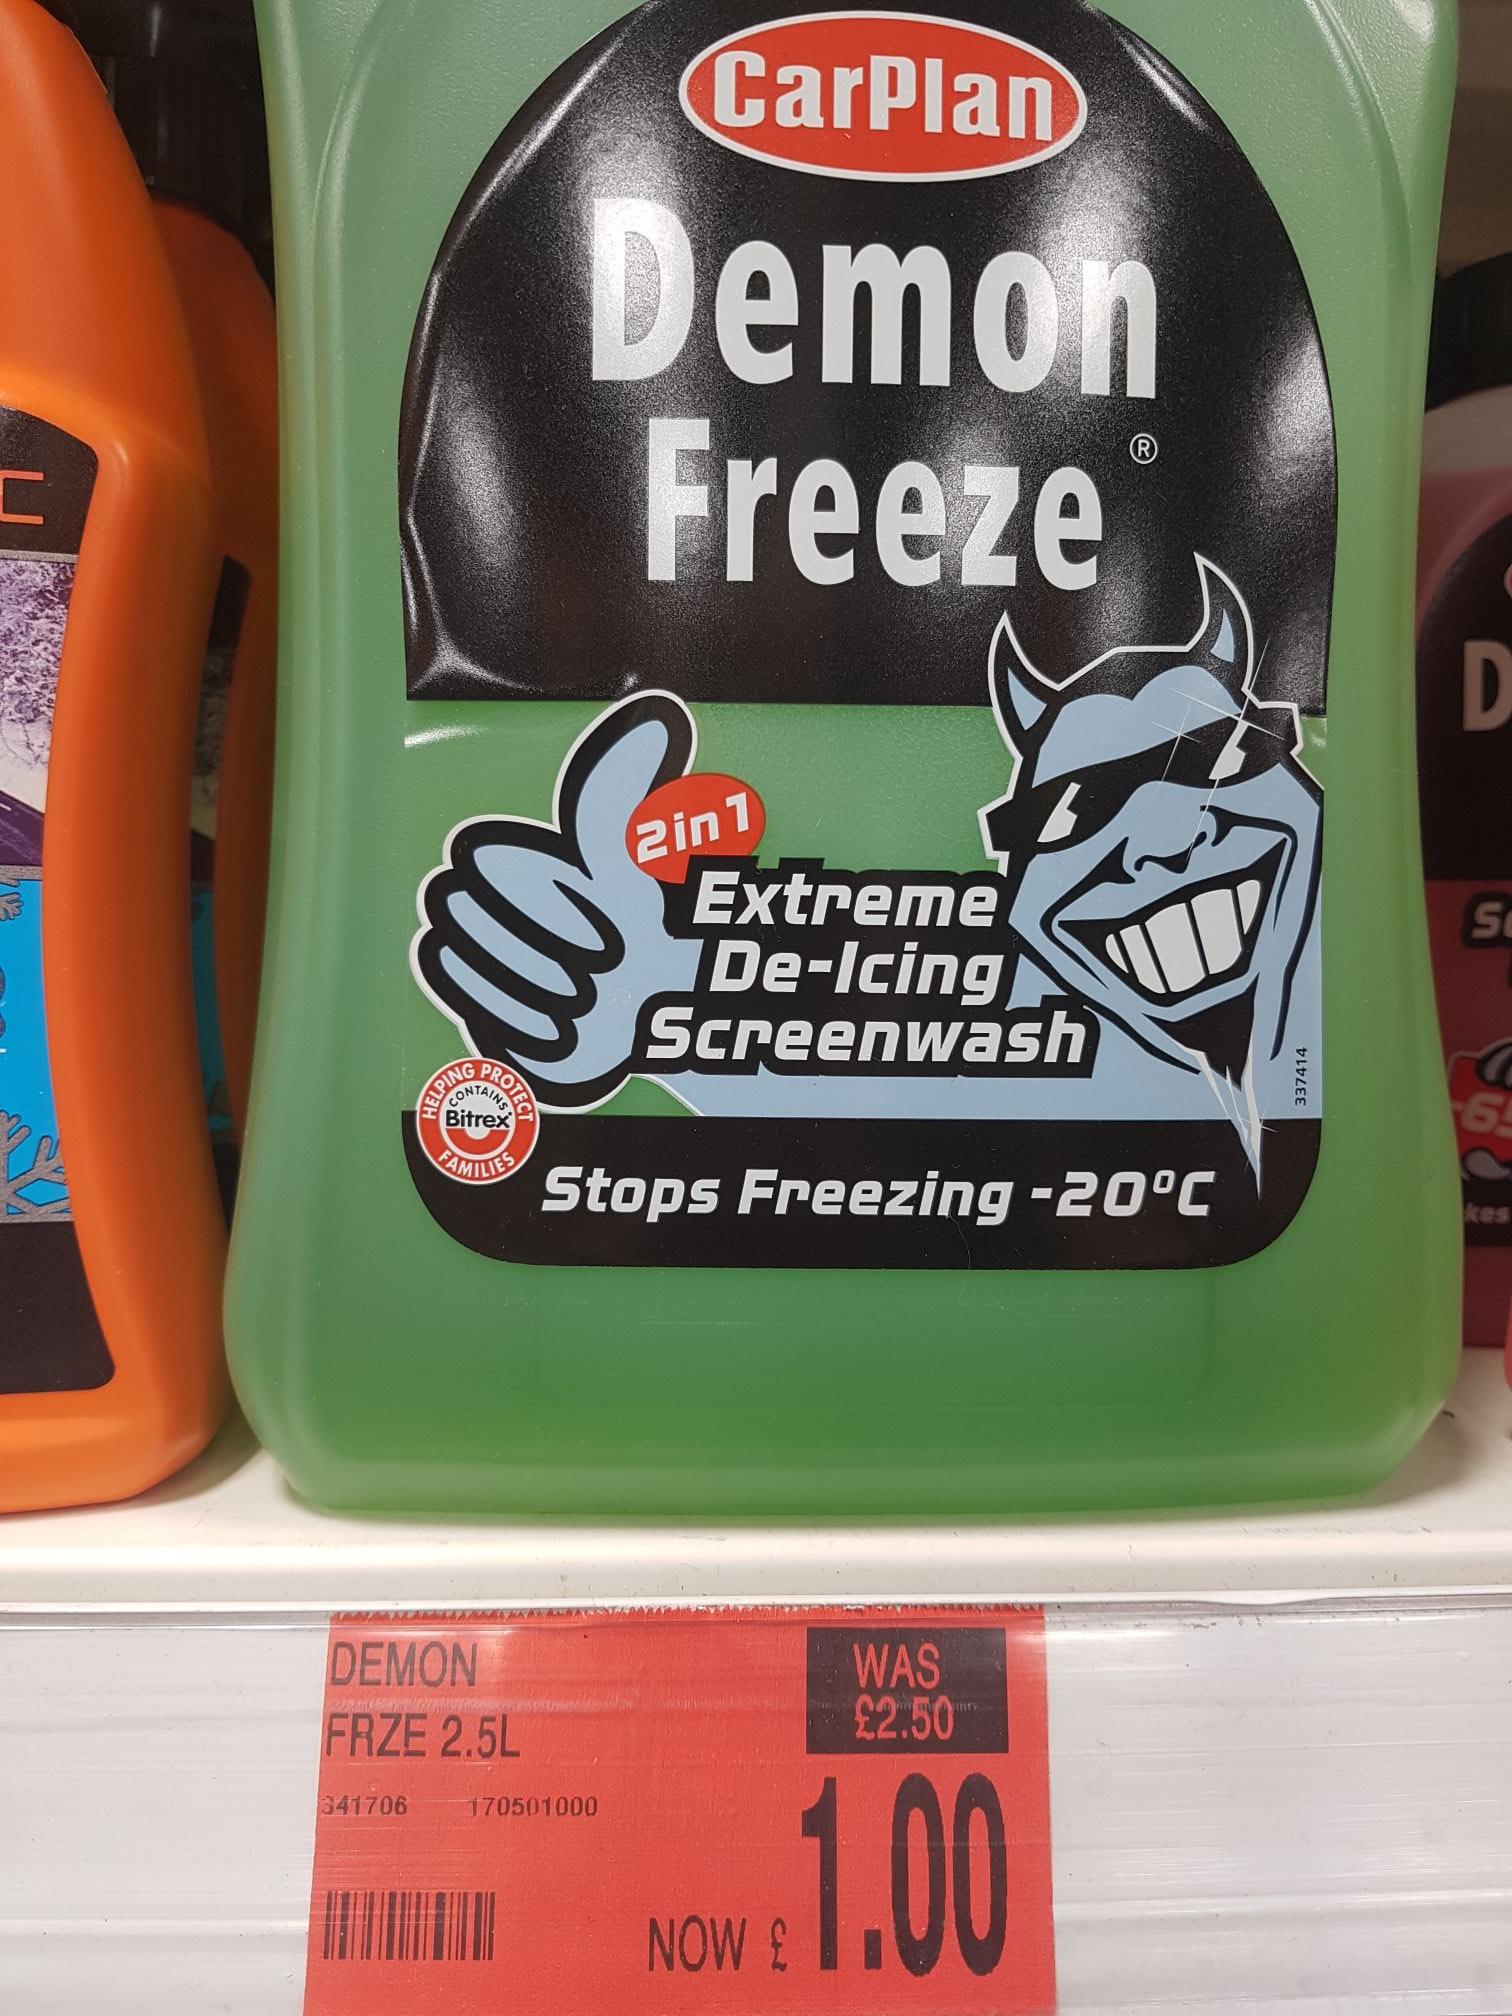 CarPlan Demon Freeze Screenwash -20 2.5L £1 instore @ B&M